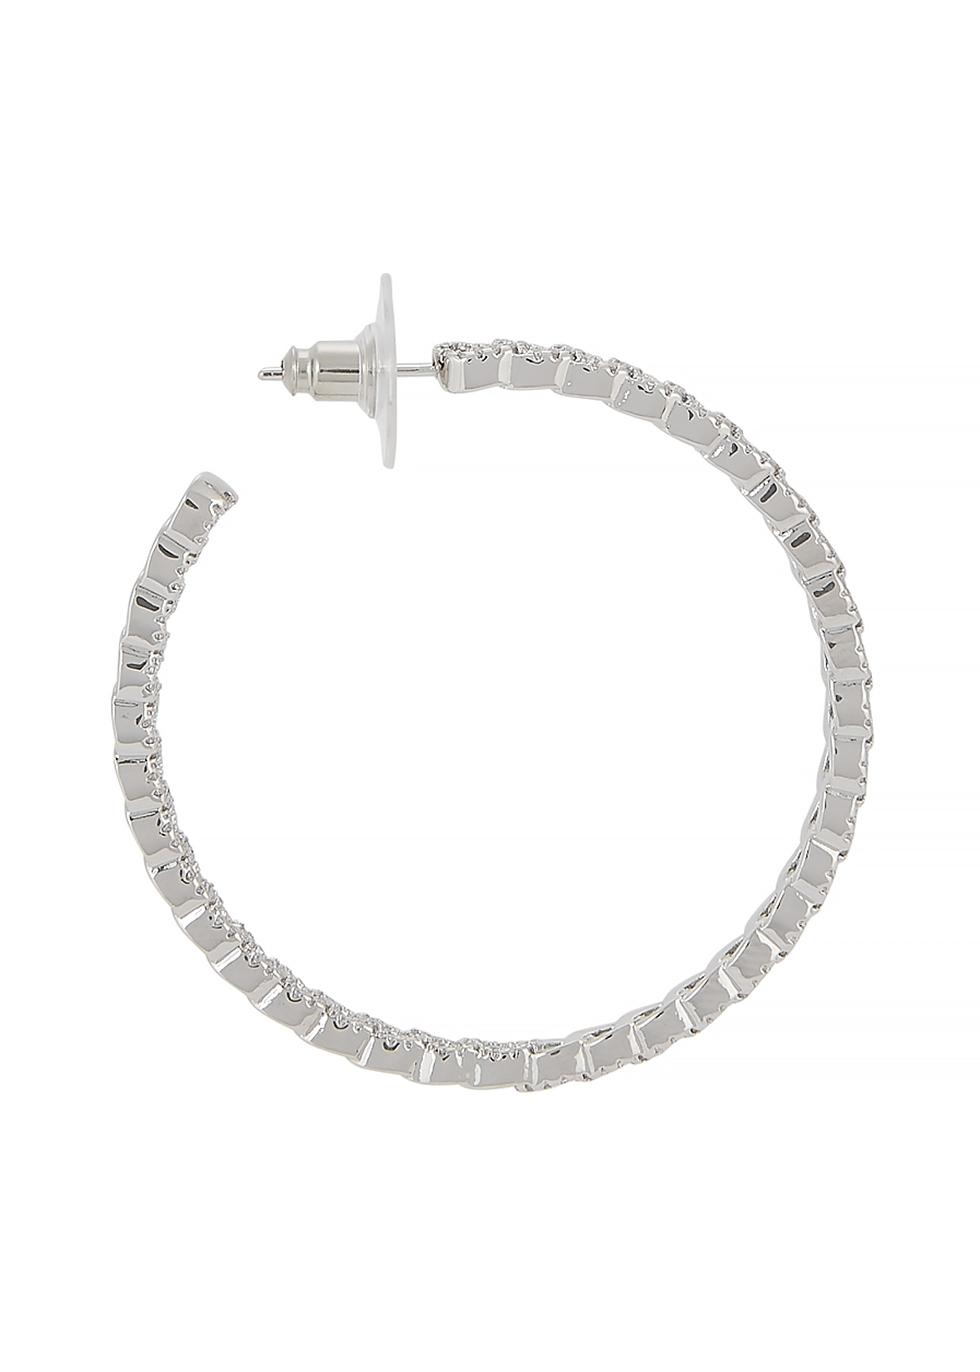 Crystal-embellished silver-tone hoop earrings - FALLON